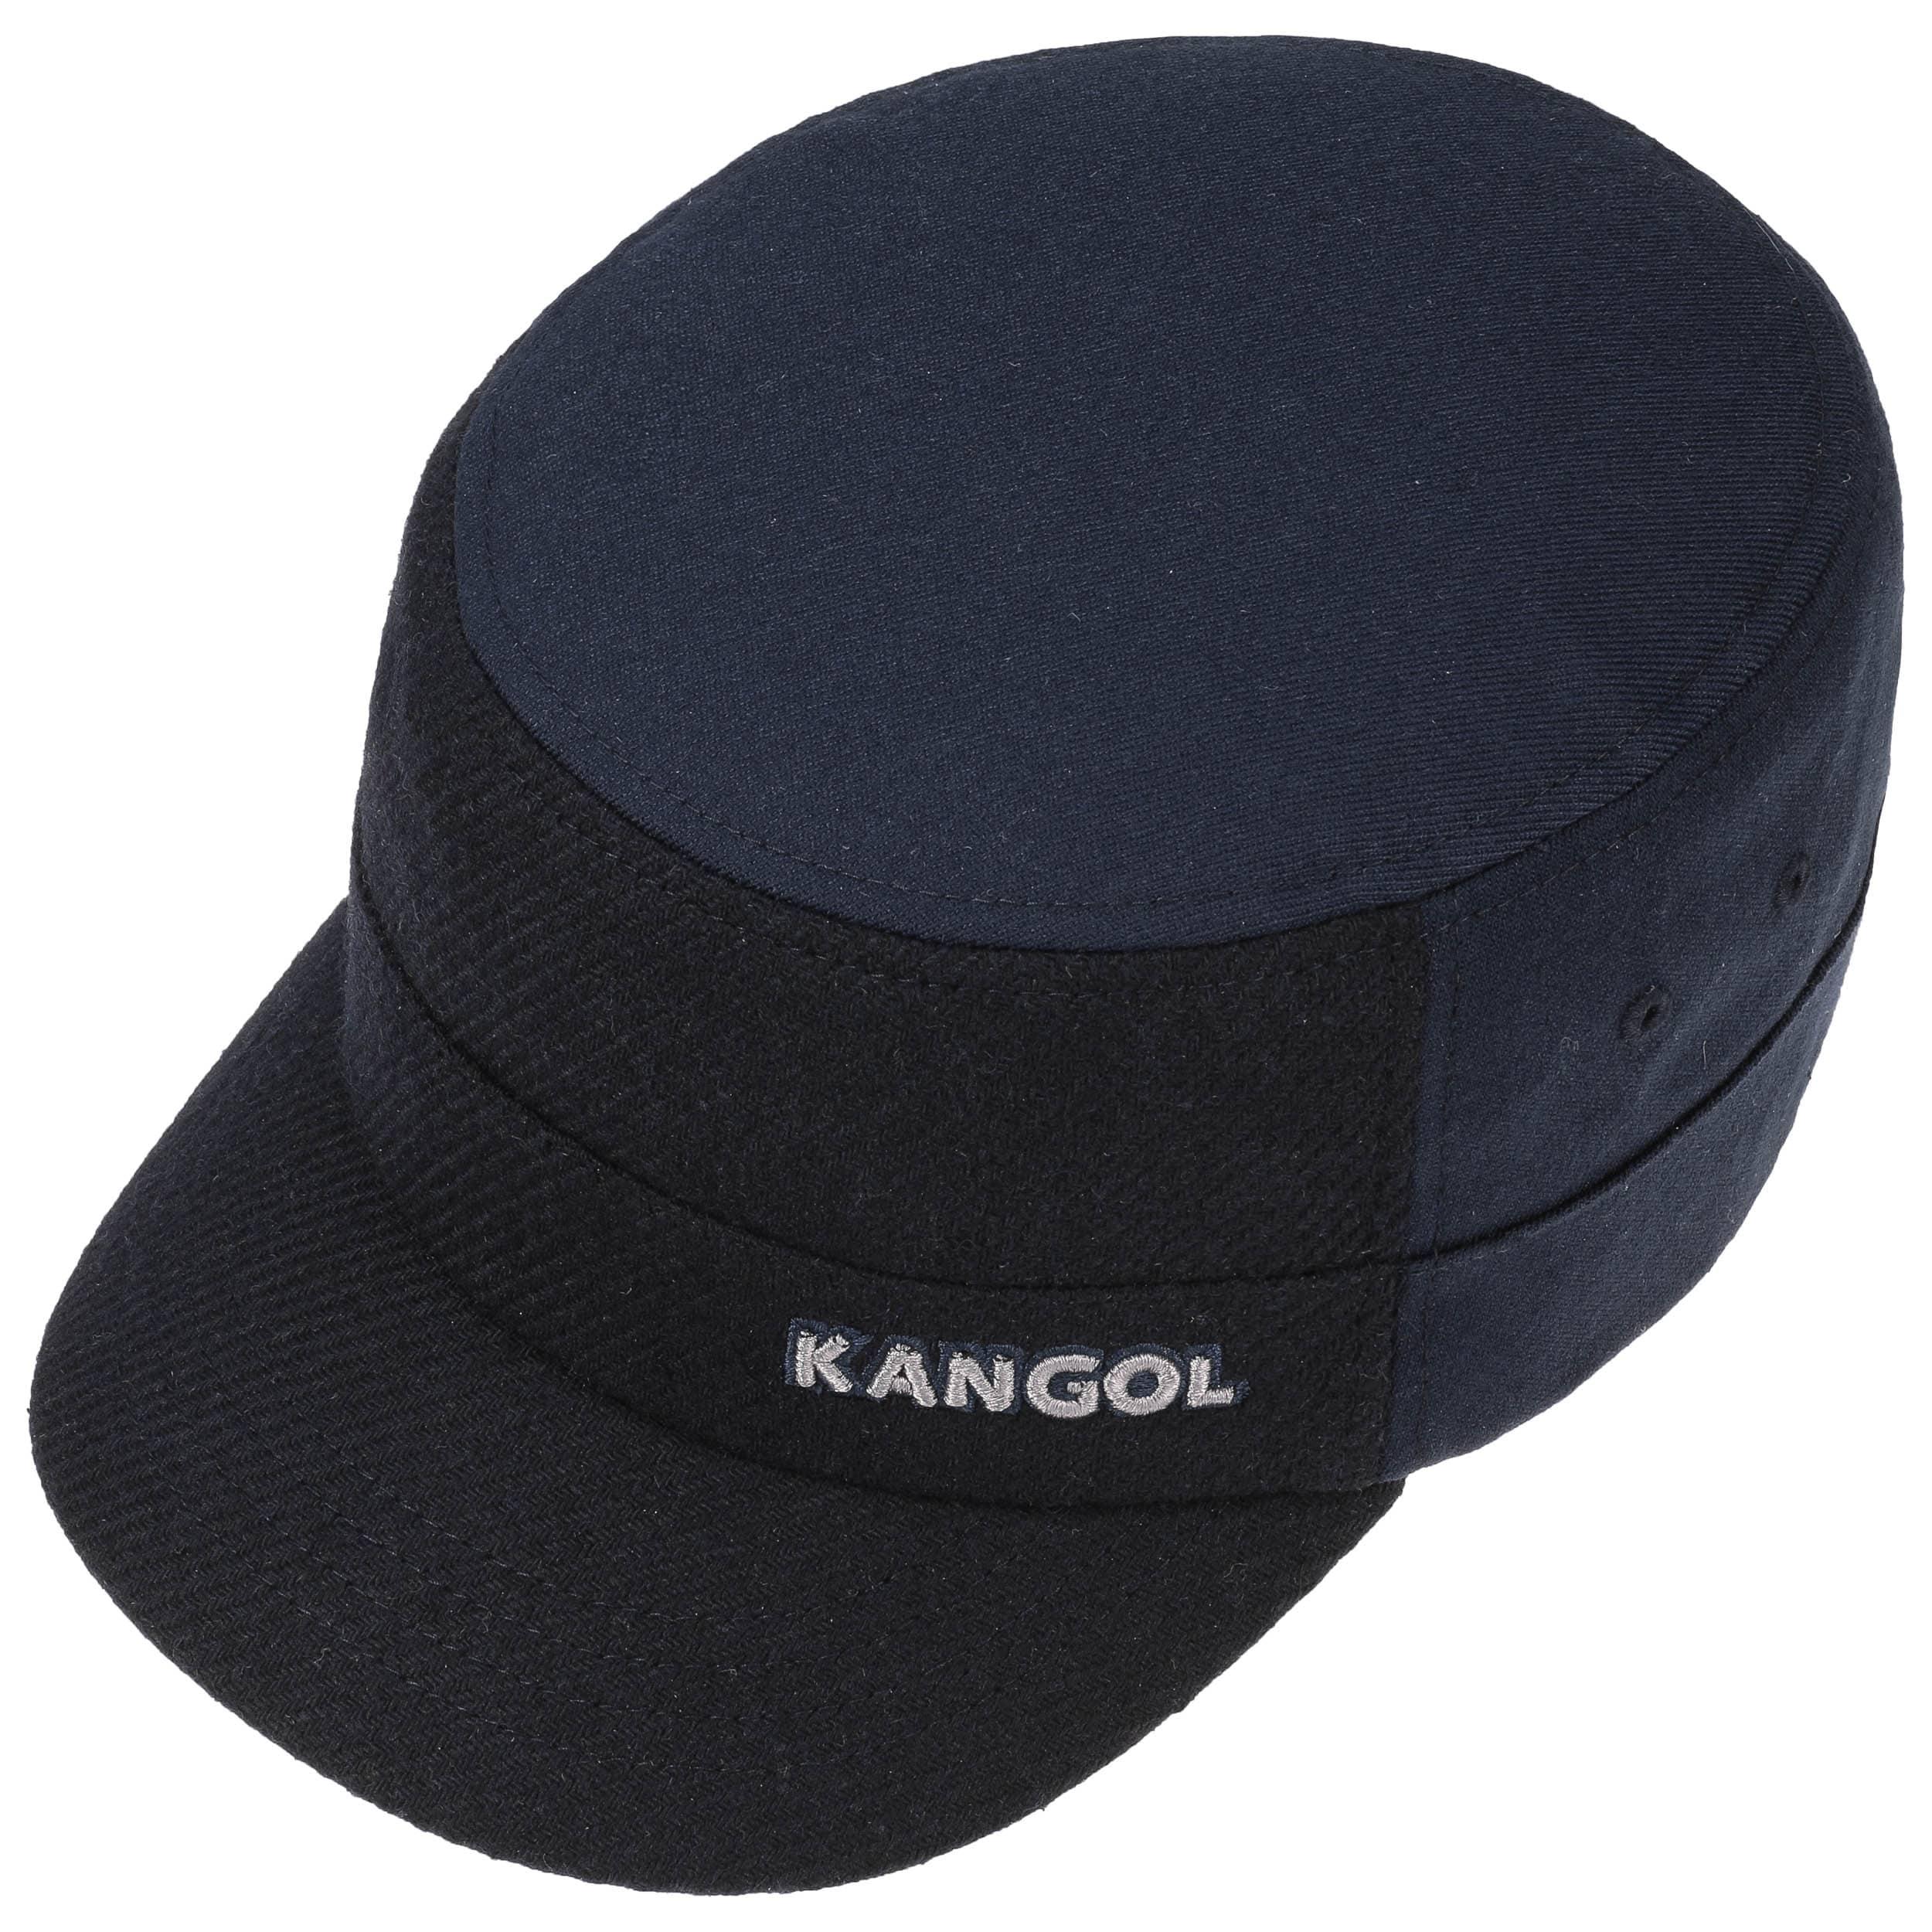 kangol textured flexfit army cap eur 3995 gt hats caps